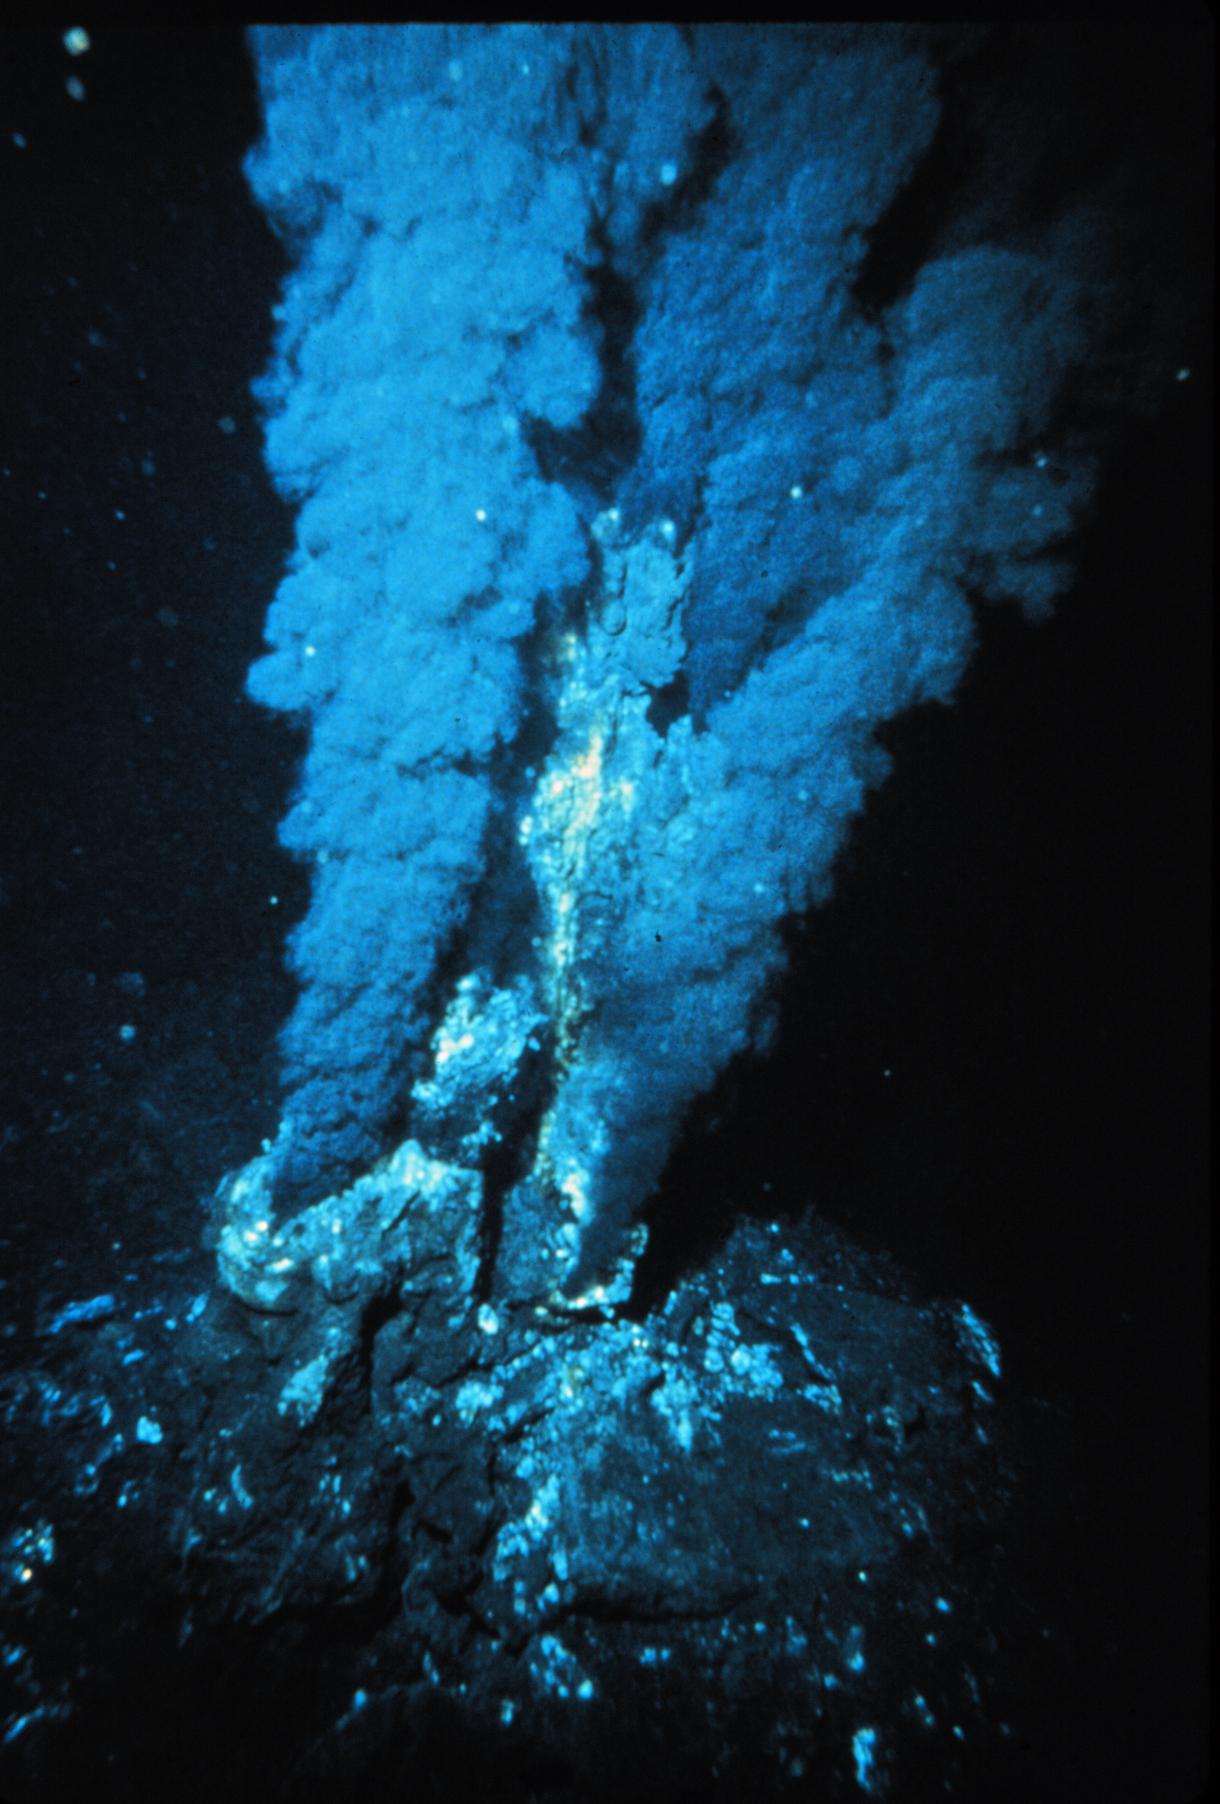 Heat flux from active crust